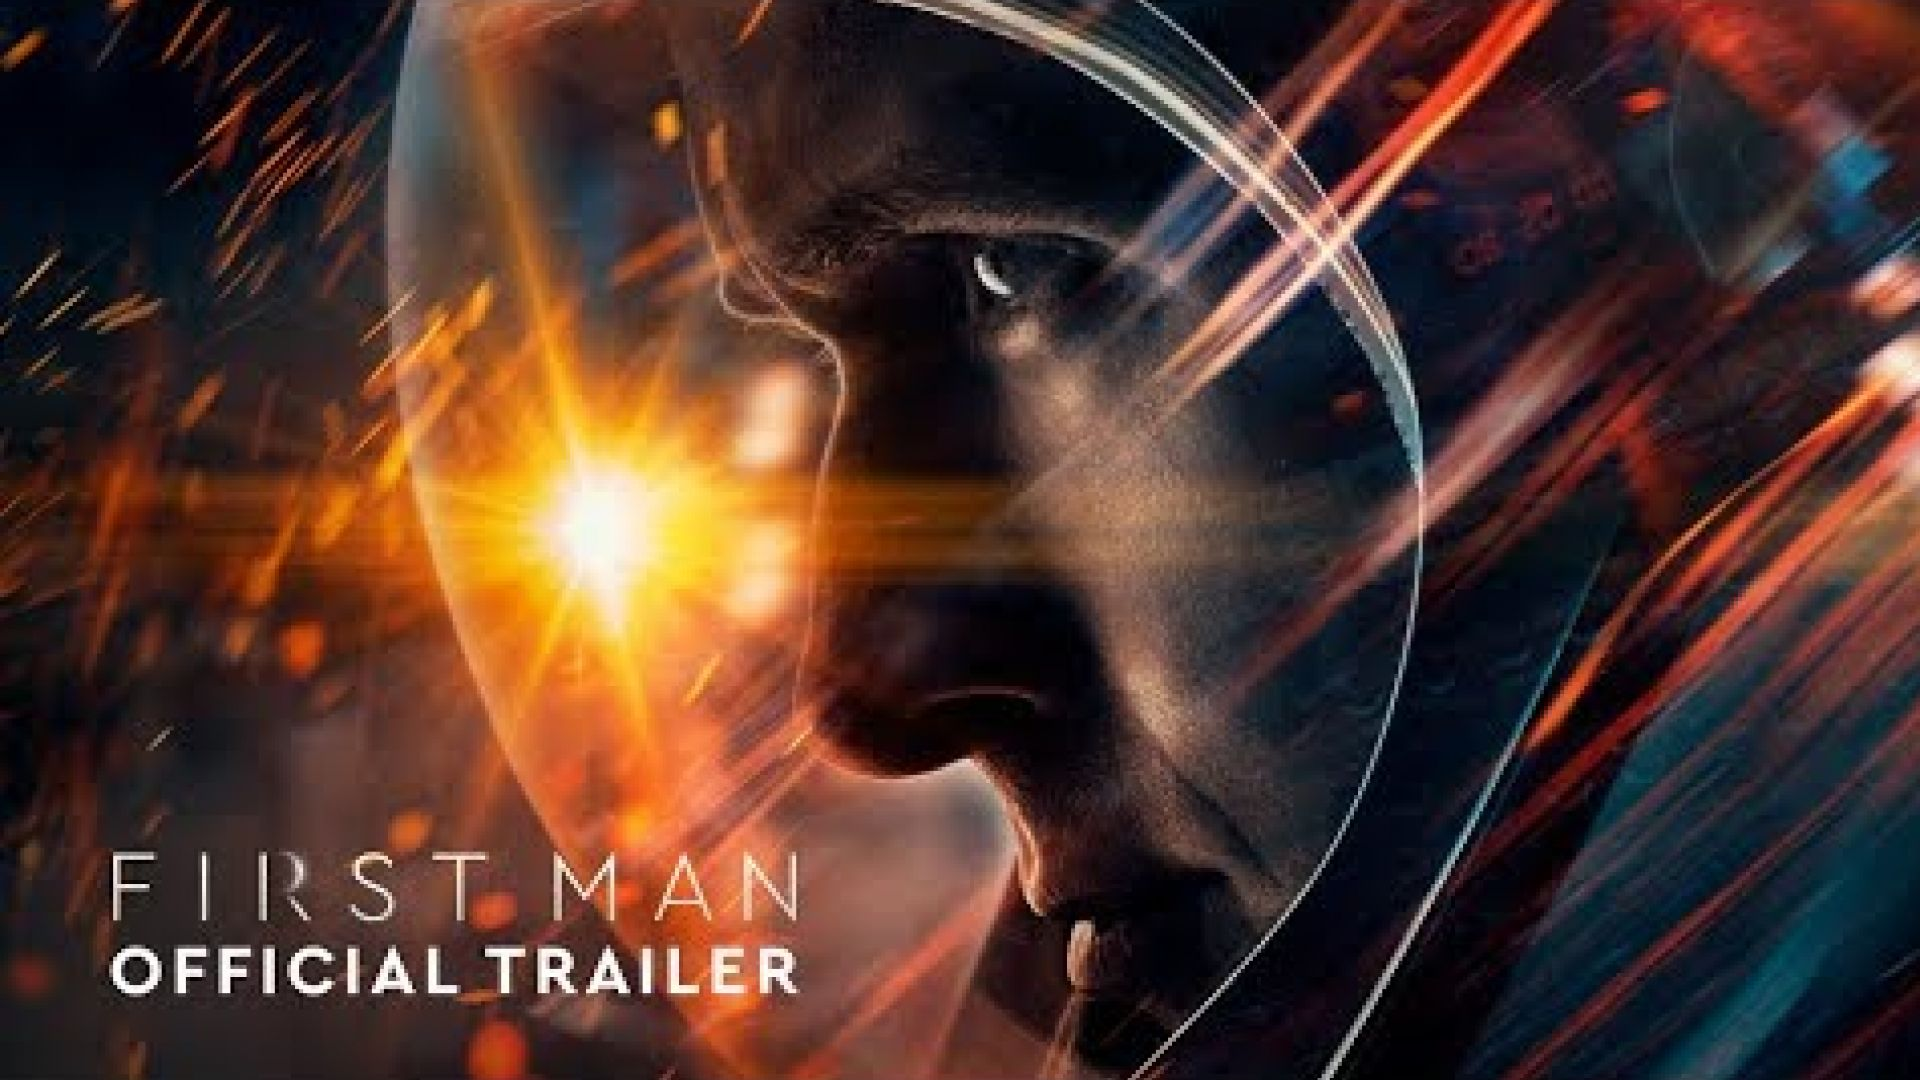 'First Man' Trailer